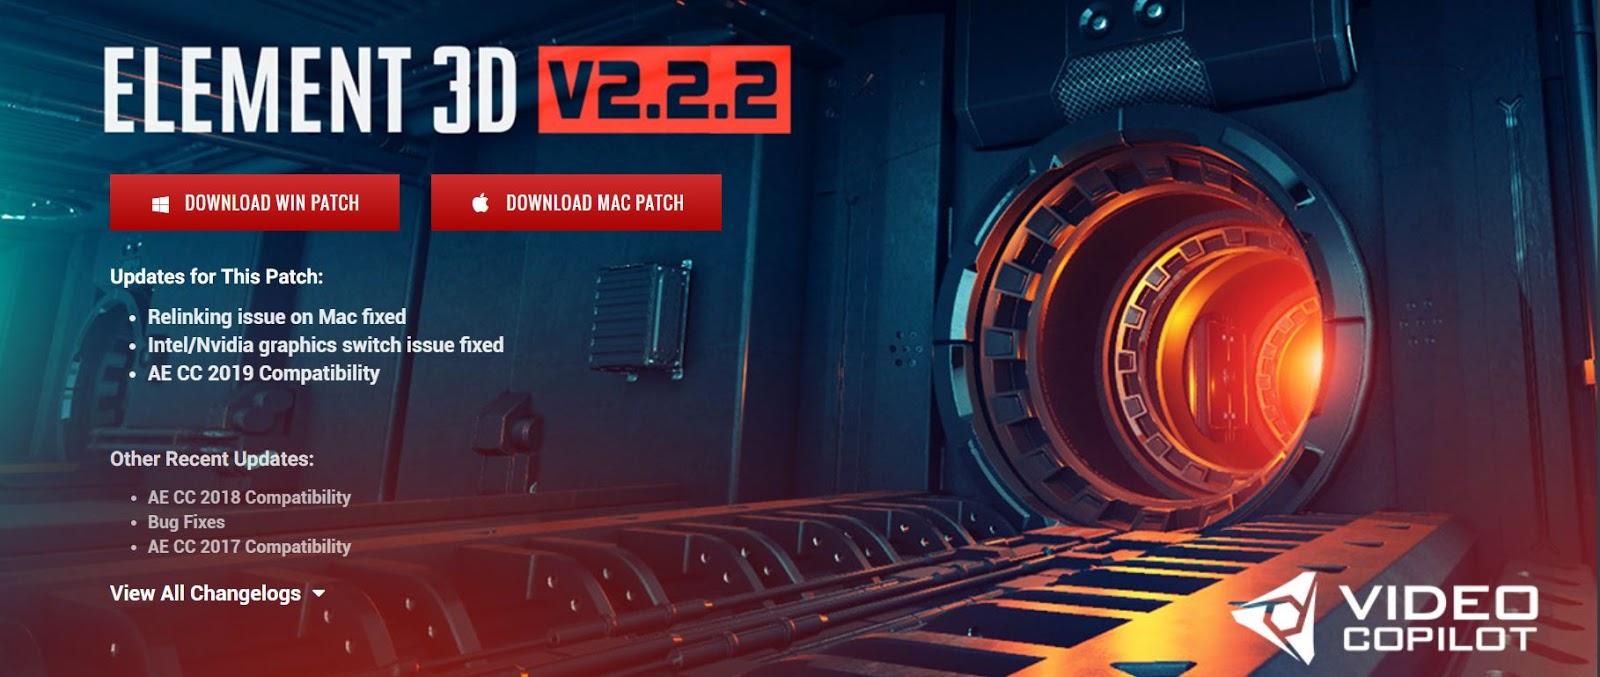 Element 3d Plugin After Effects Download Mac